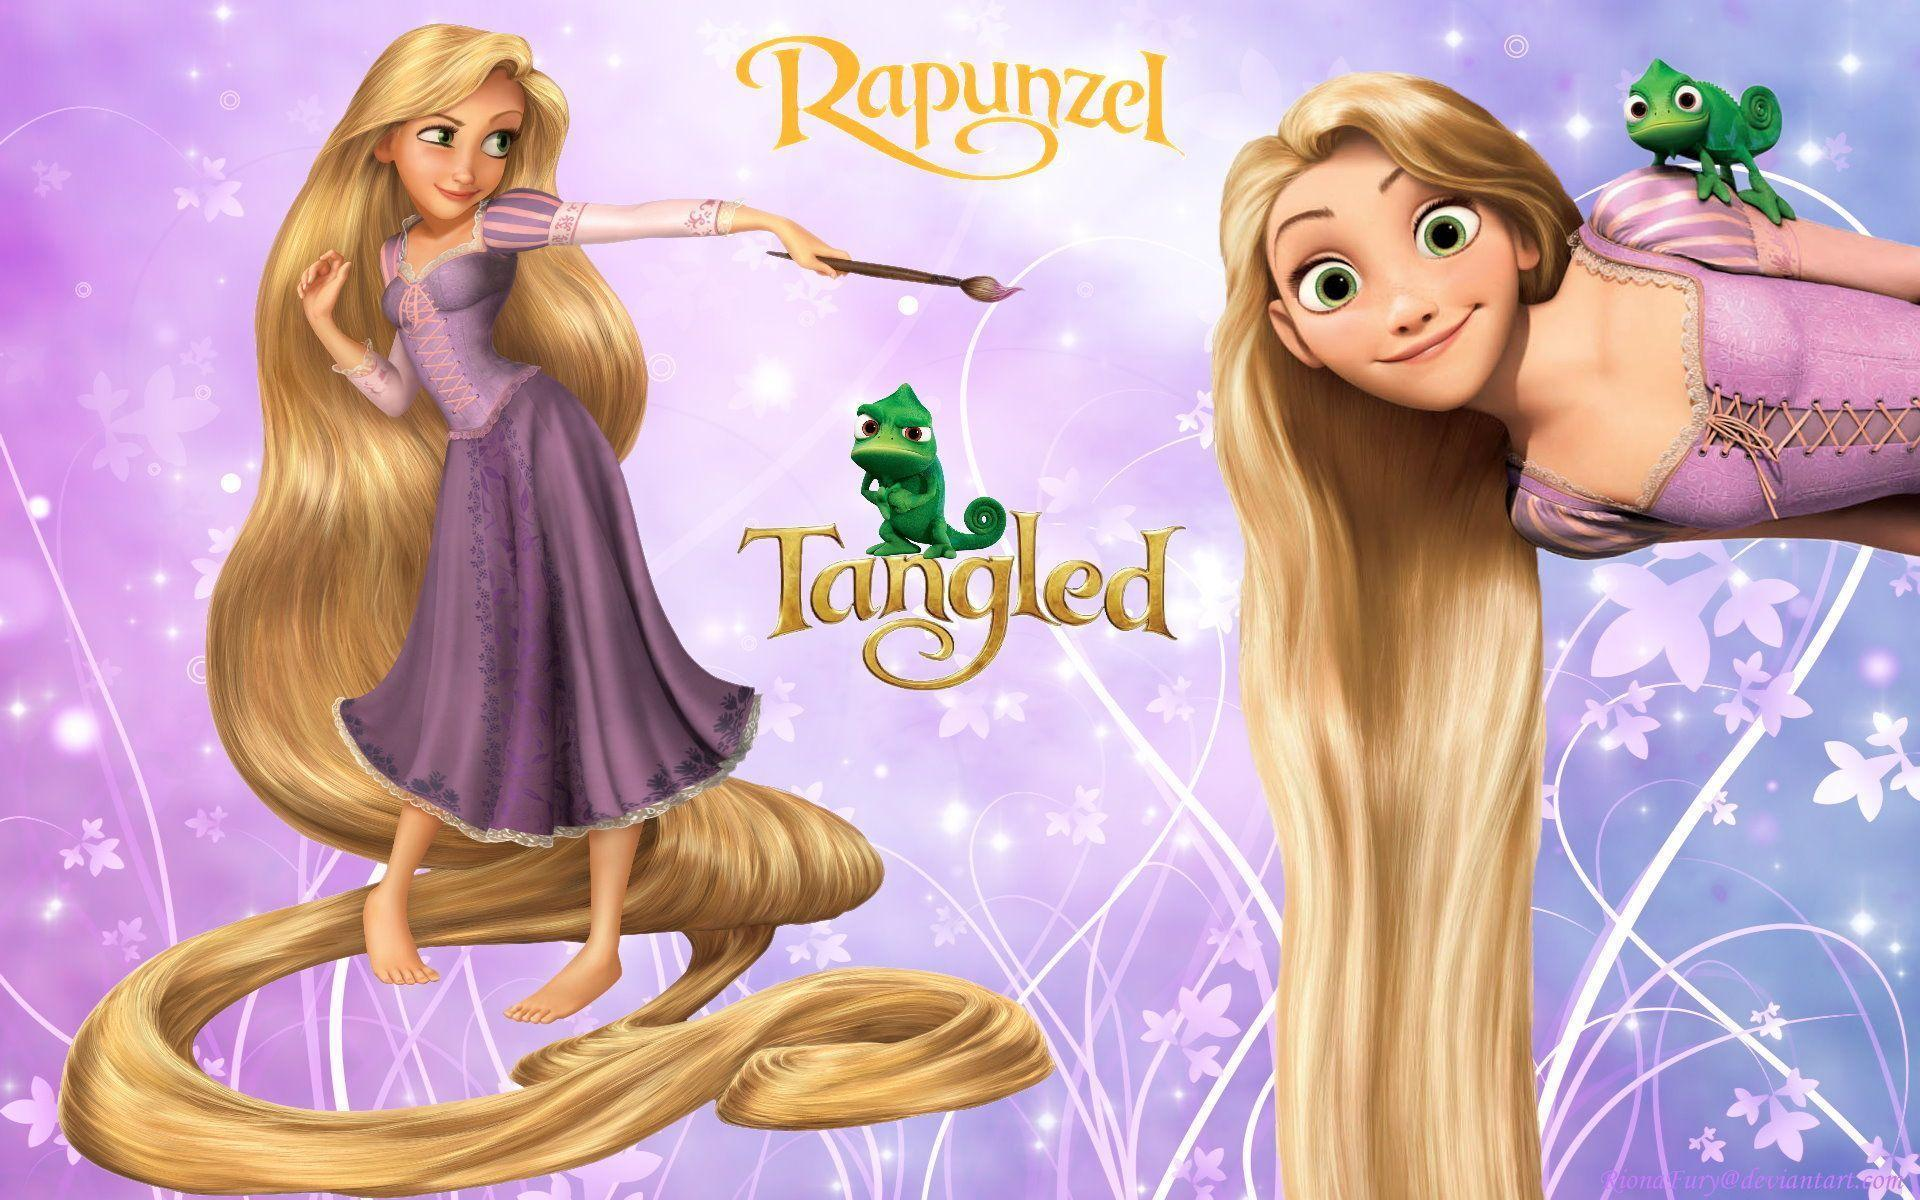 Disney Princess Rapunzel - Tangled Wallpaper (23744590) - Fanpop